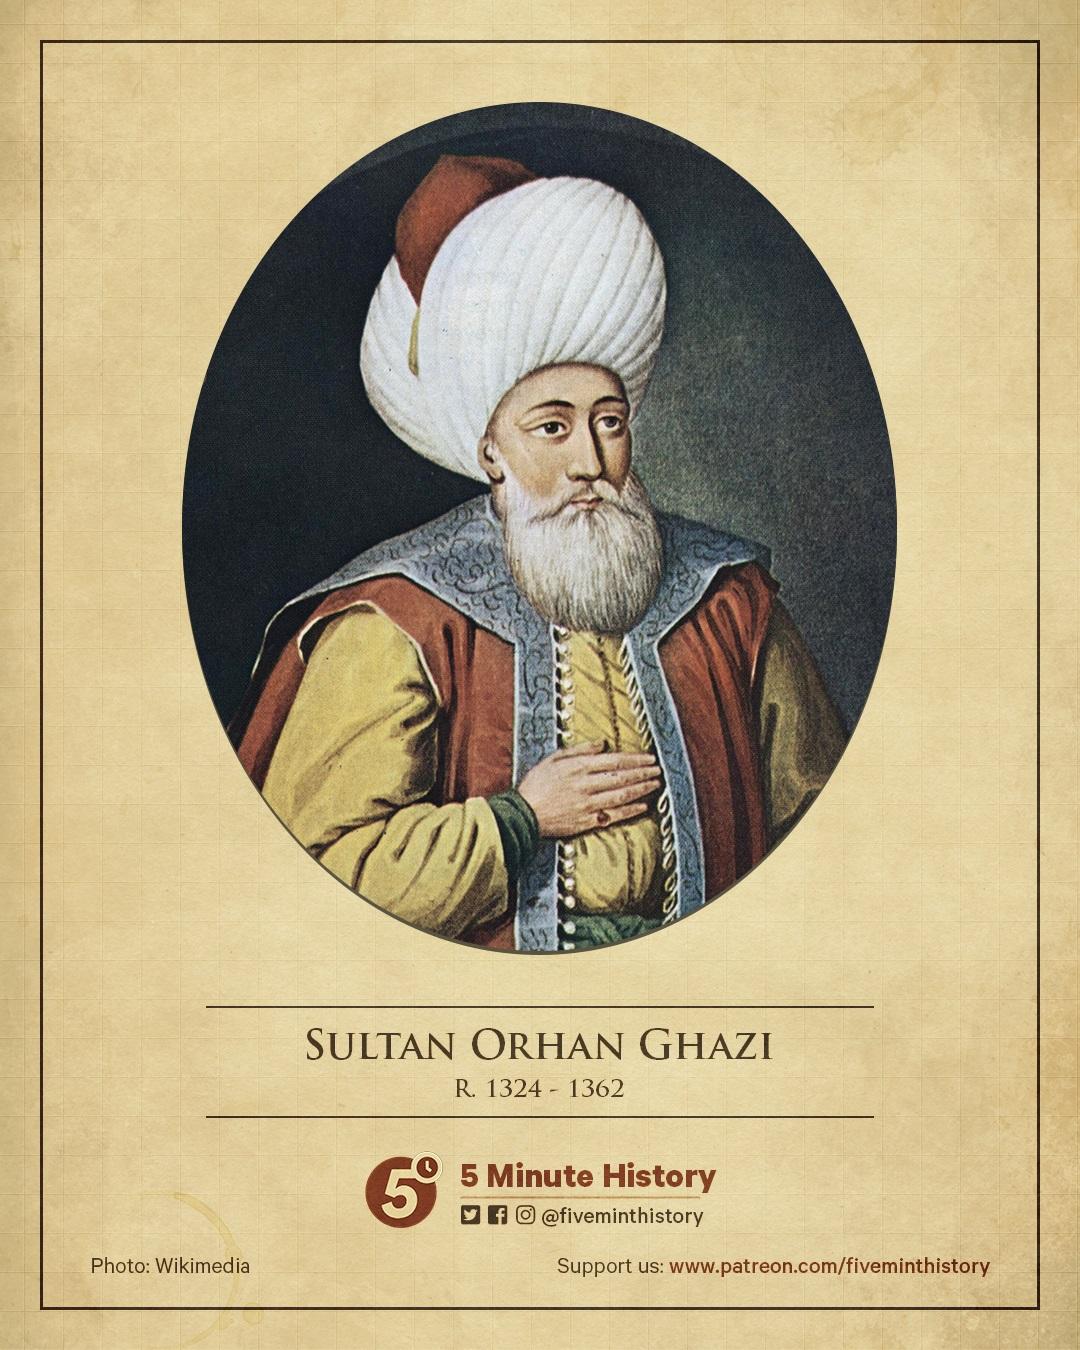 Sultan Orhan Ghazi, a brief biography